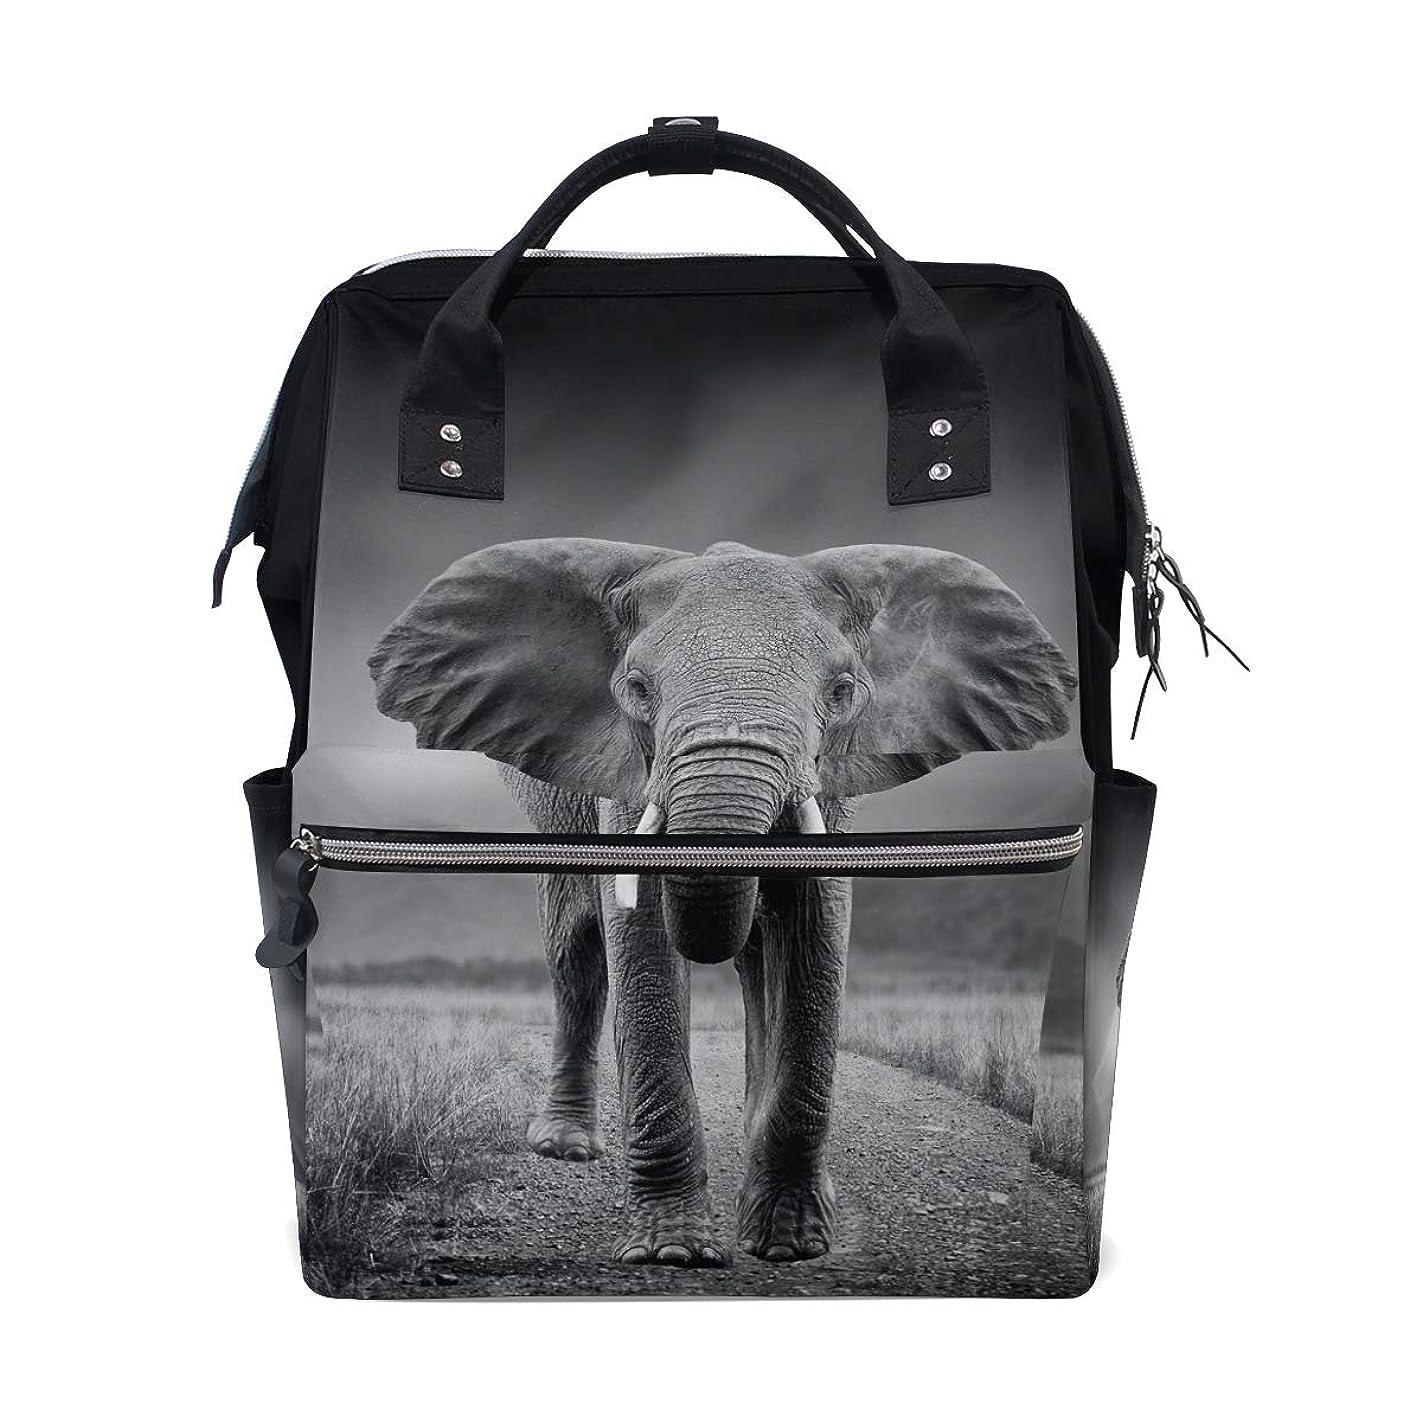 Black And Grey African Elephant School Backpack Large Capacity Mummy Bags Laptop Handbag Casual Travel Rucksack Satchel For Women Men Adult Teen Children y33934614565